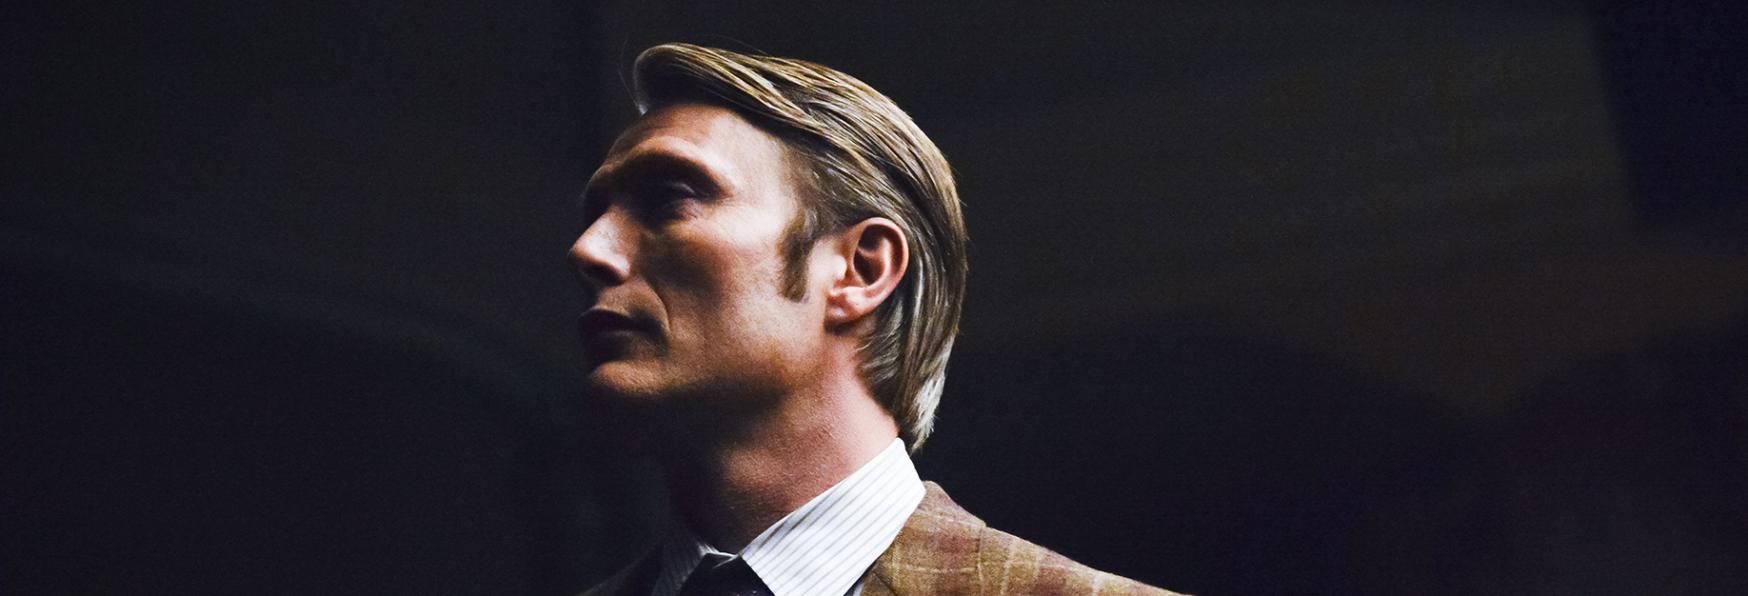 Hannibal 4: Mads Mikkelsen continua a sperare in una nuova Stagione